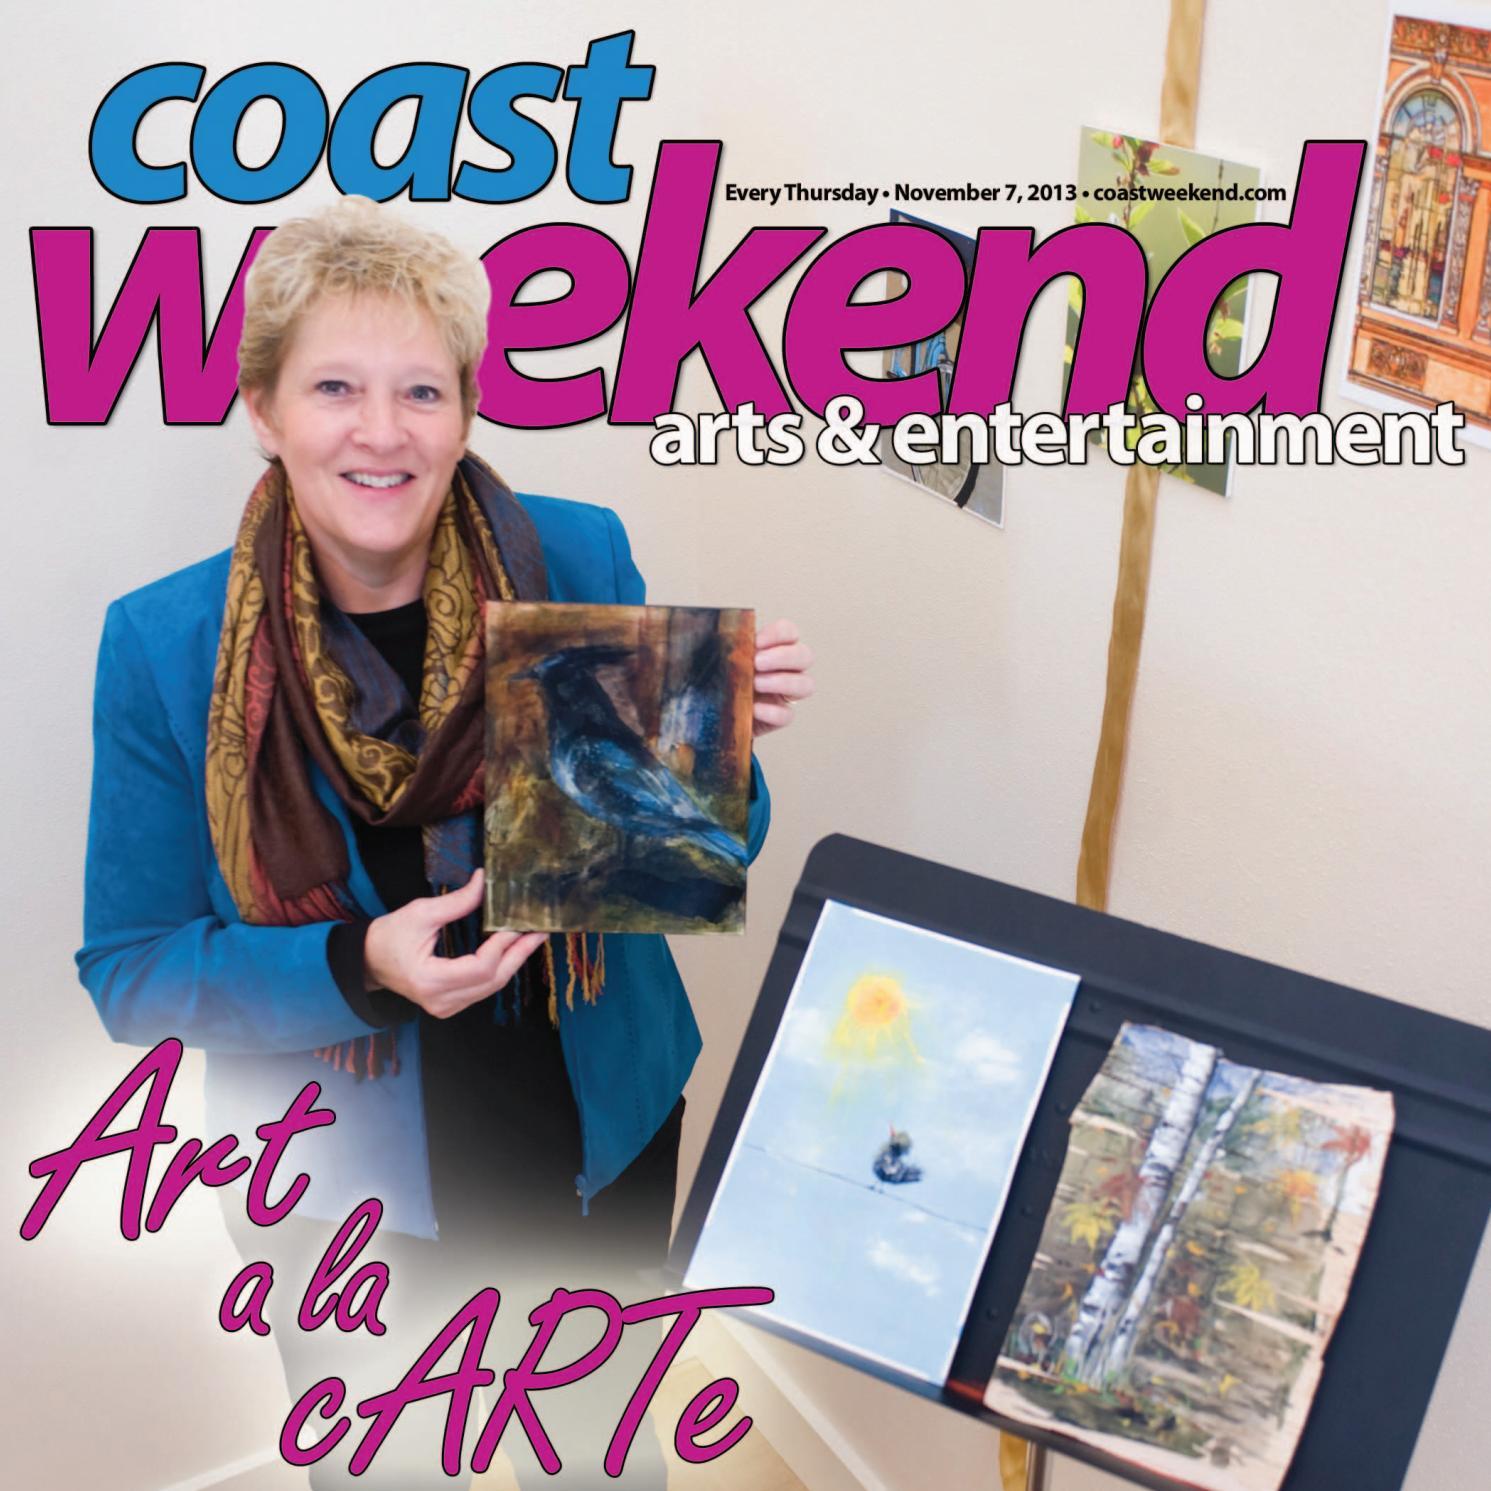 3c6fa7687 Coast Weekend November 7, 2013 by Our Coast - issuu